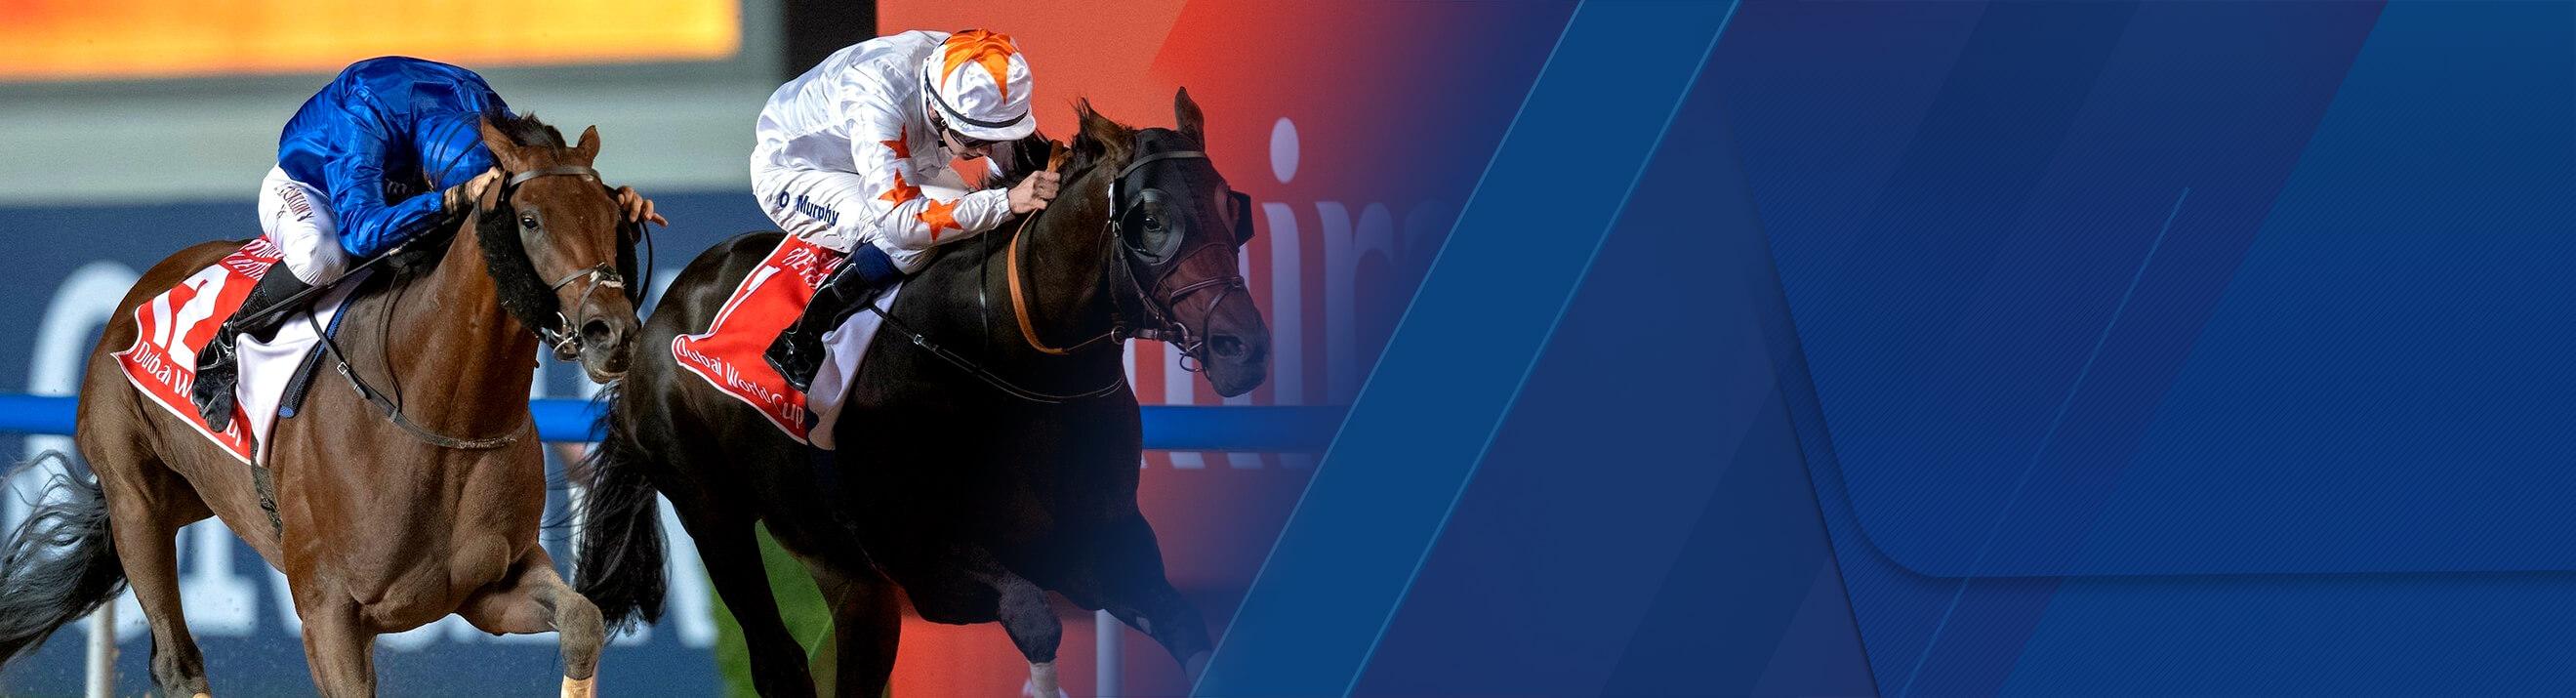 Dubai horse racing betting legal sports betting in arizona